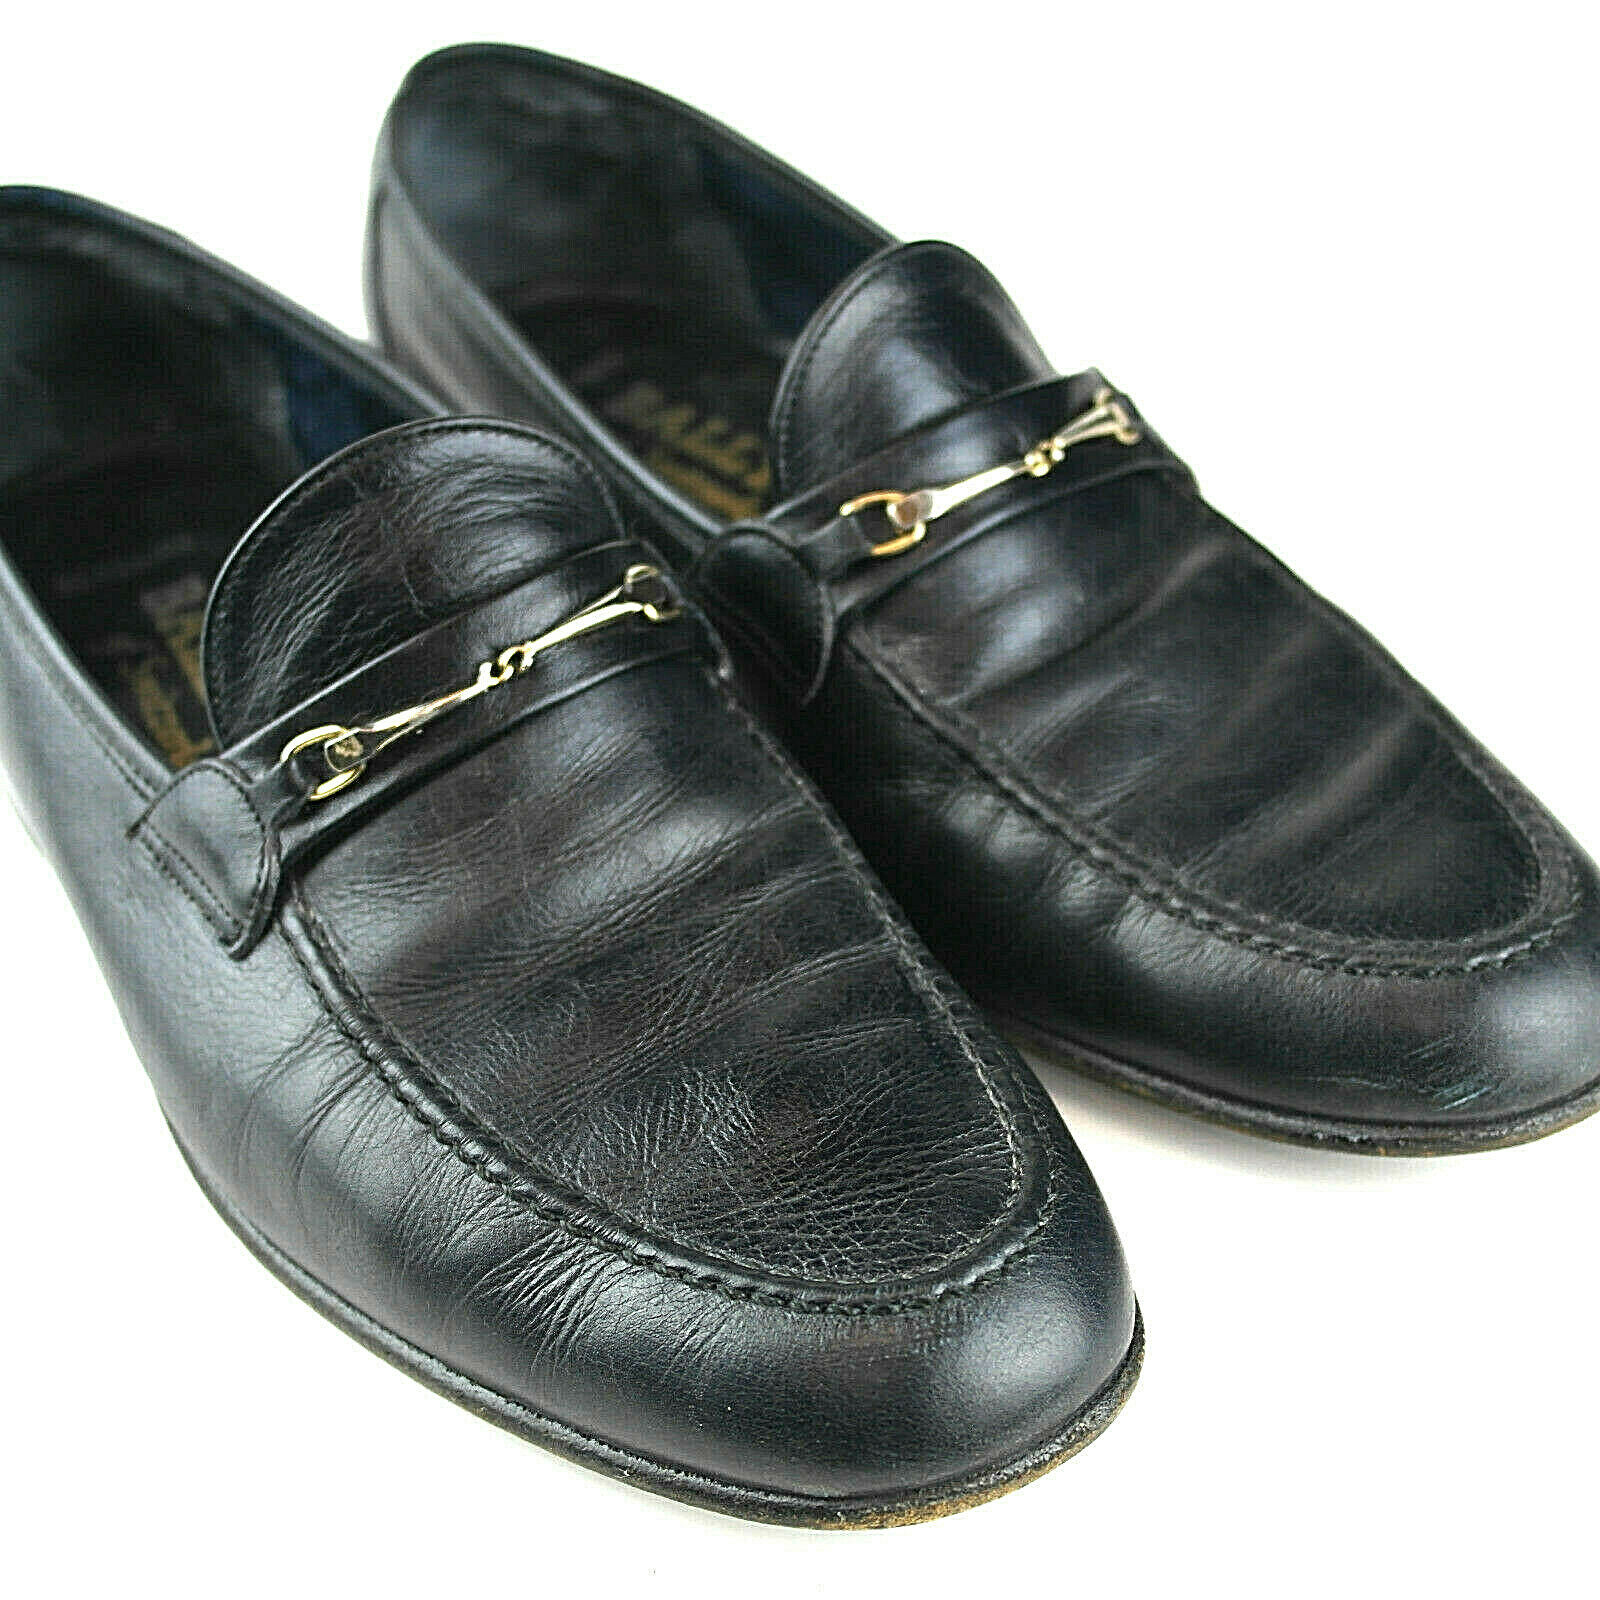 BALLY Bergamo Femme Taille 8 Slip-On Mocassins-Suisse Chaussures en Cuir Noir